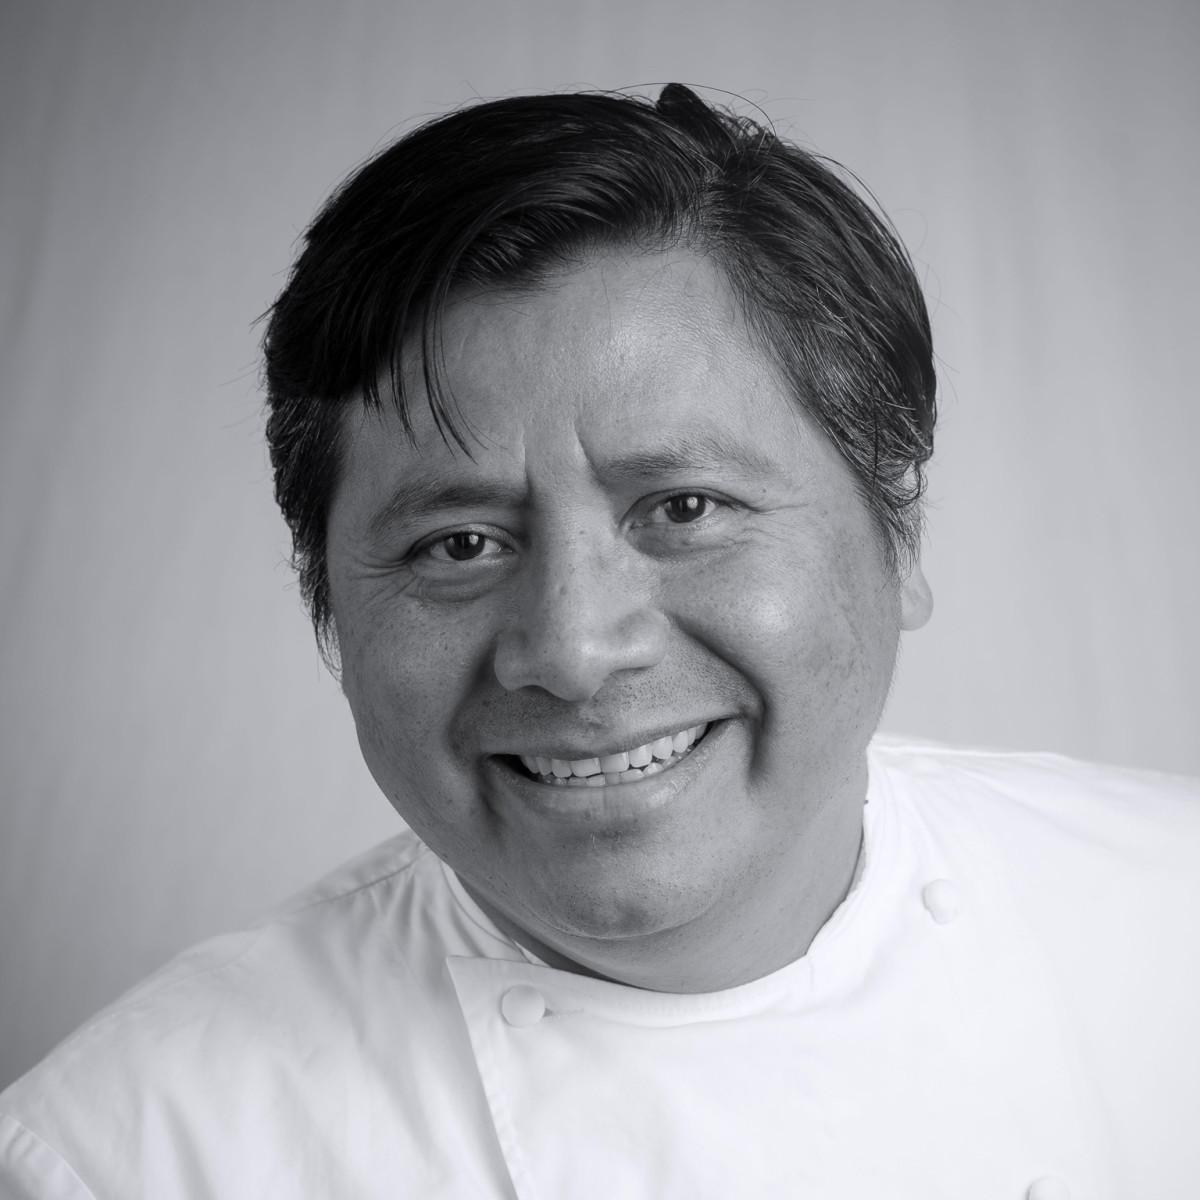 Magnol French Baking Otto Sanchez